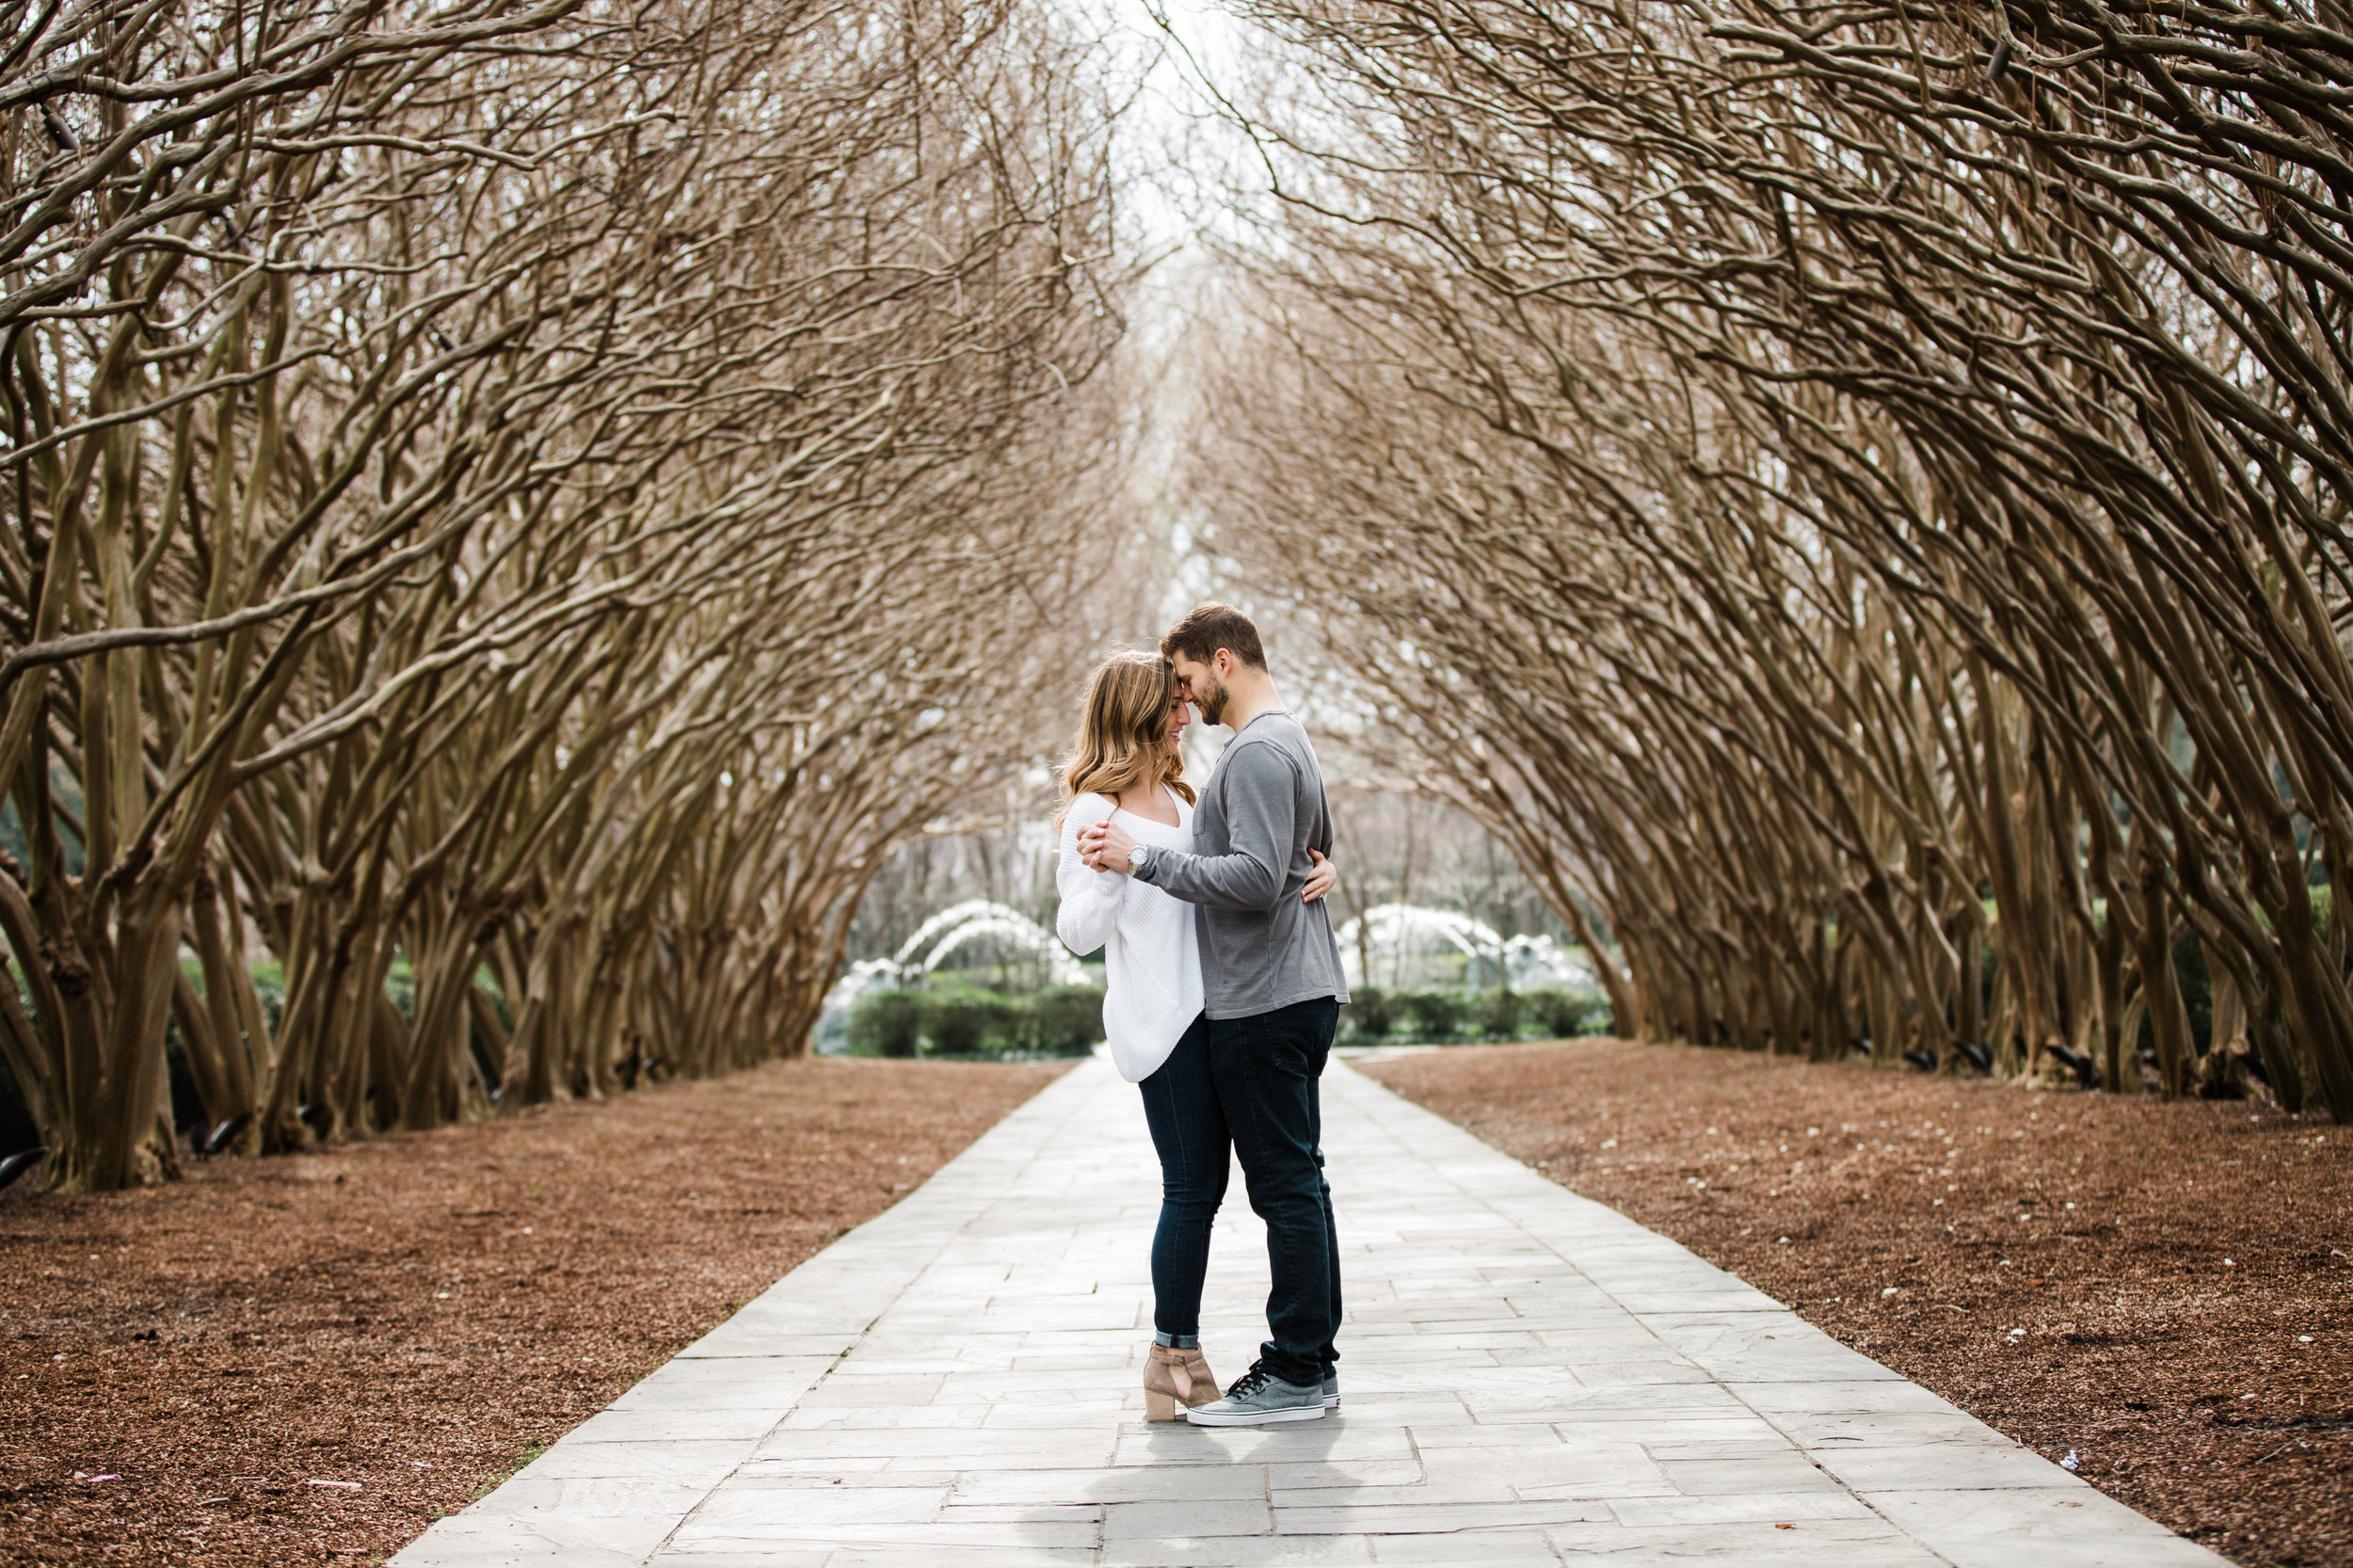 Dallas-Texas-Engagement-Session-Dallas-Arboretum-L.A.R.Weddings-Lindsey-Ramdin-26.jpg